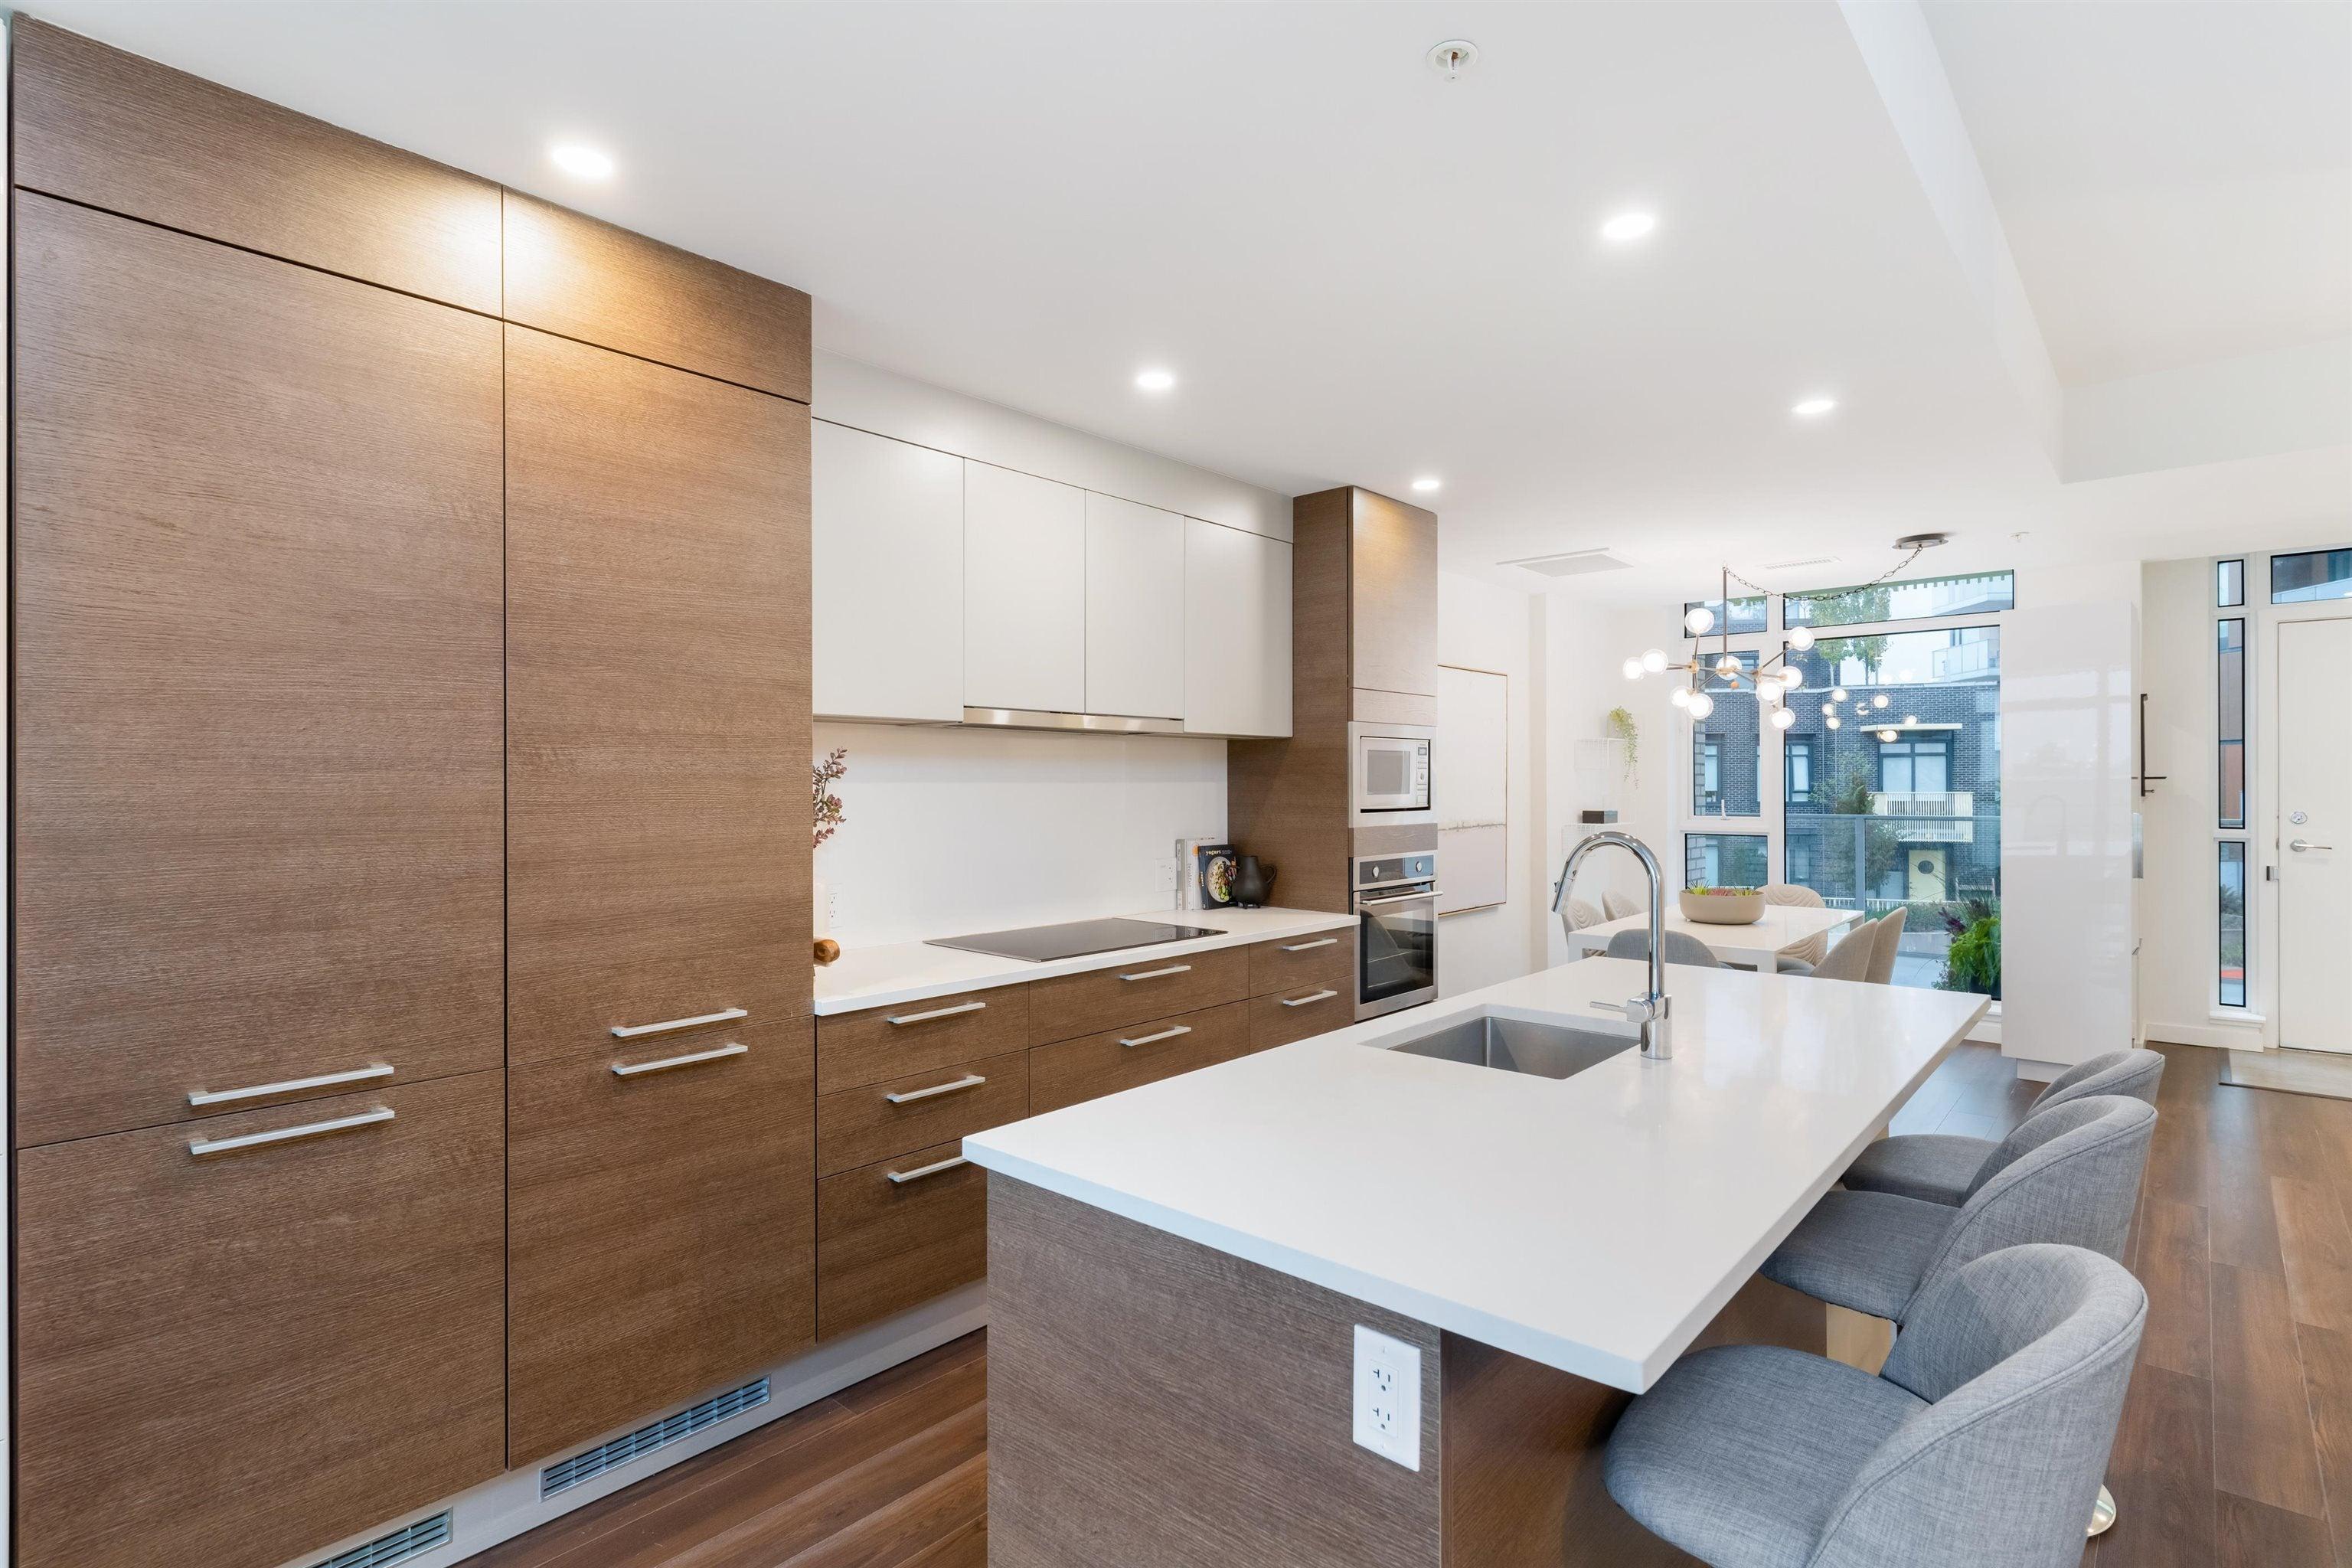 523 2508 WATSON STREET - Mount Pleasant VE Townhouse for sale, 3 Bedrooms (R2625701) - #11